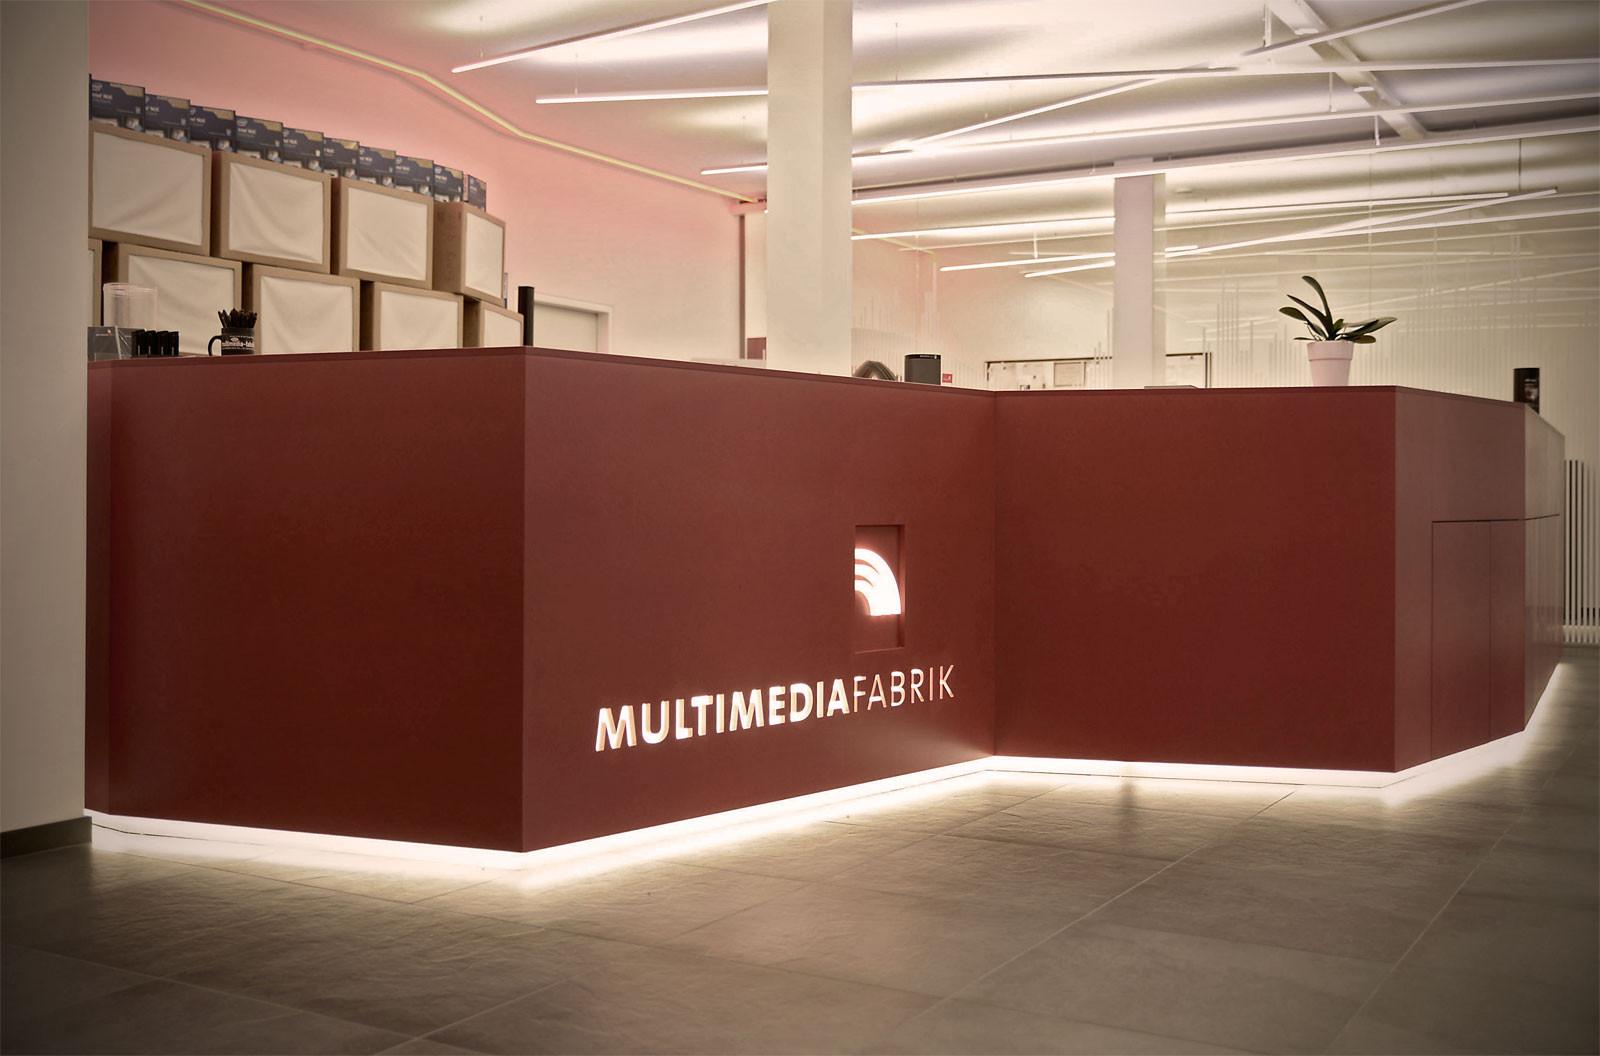 Multimediafabrik